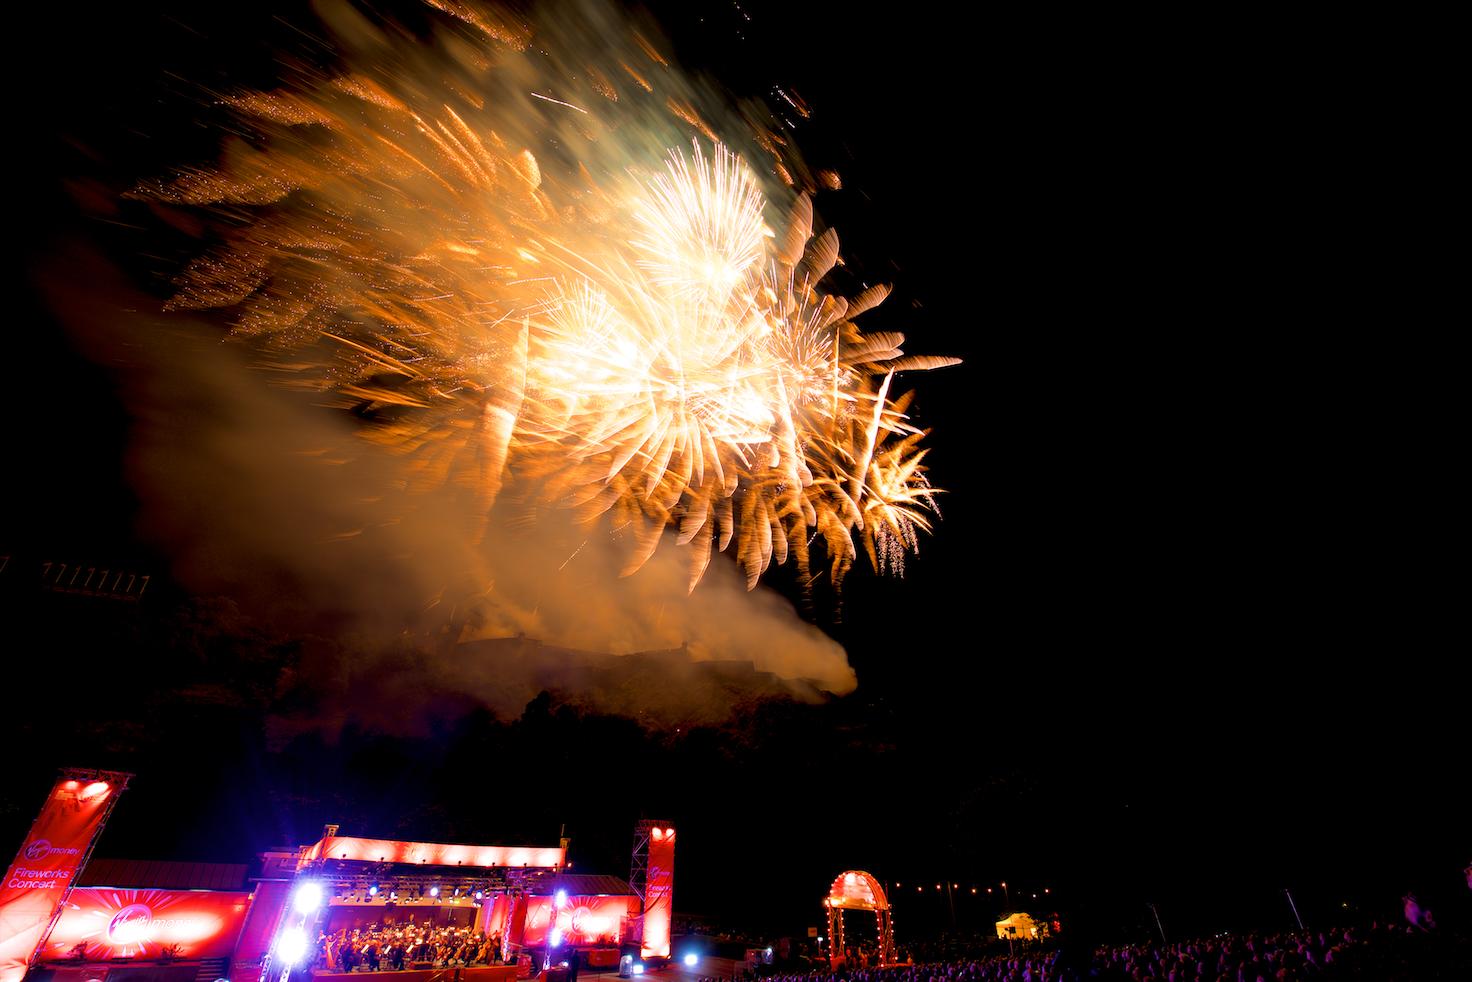 virgin-money-fireworks-concert-edinburgh-castleedinburgh-international-festival-edinburgh-castle-29th-august-2016-16